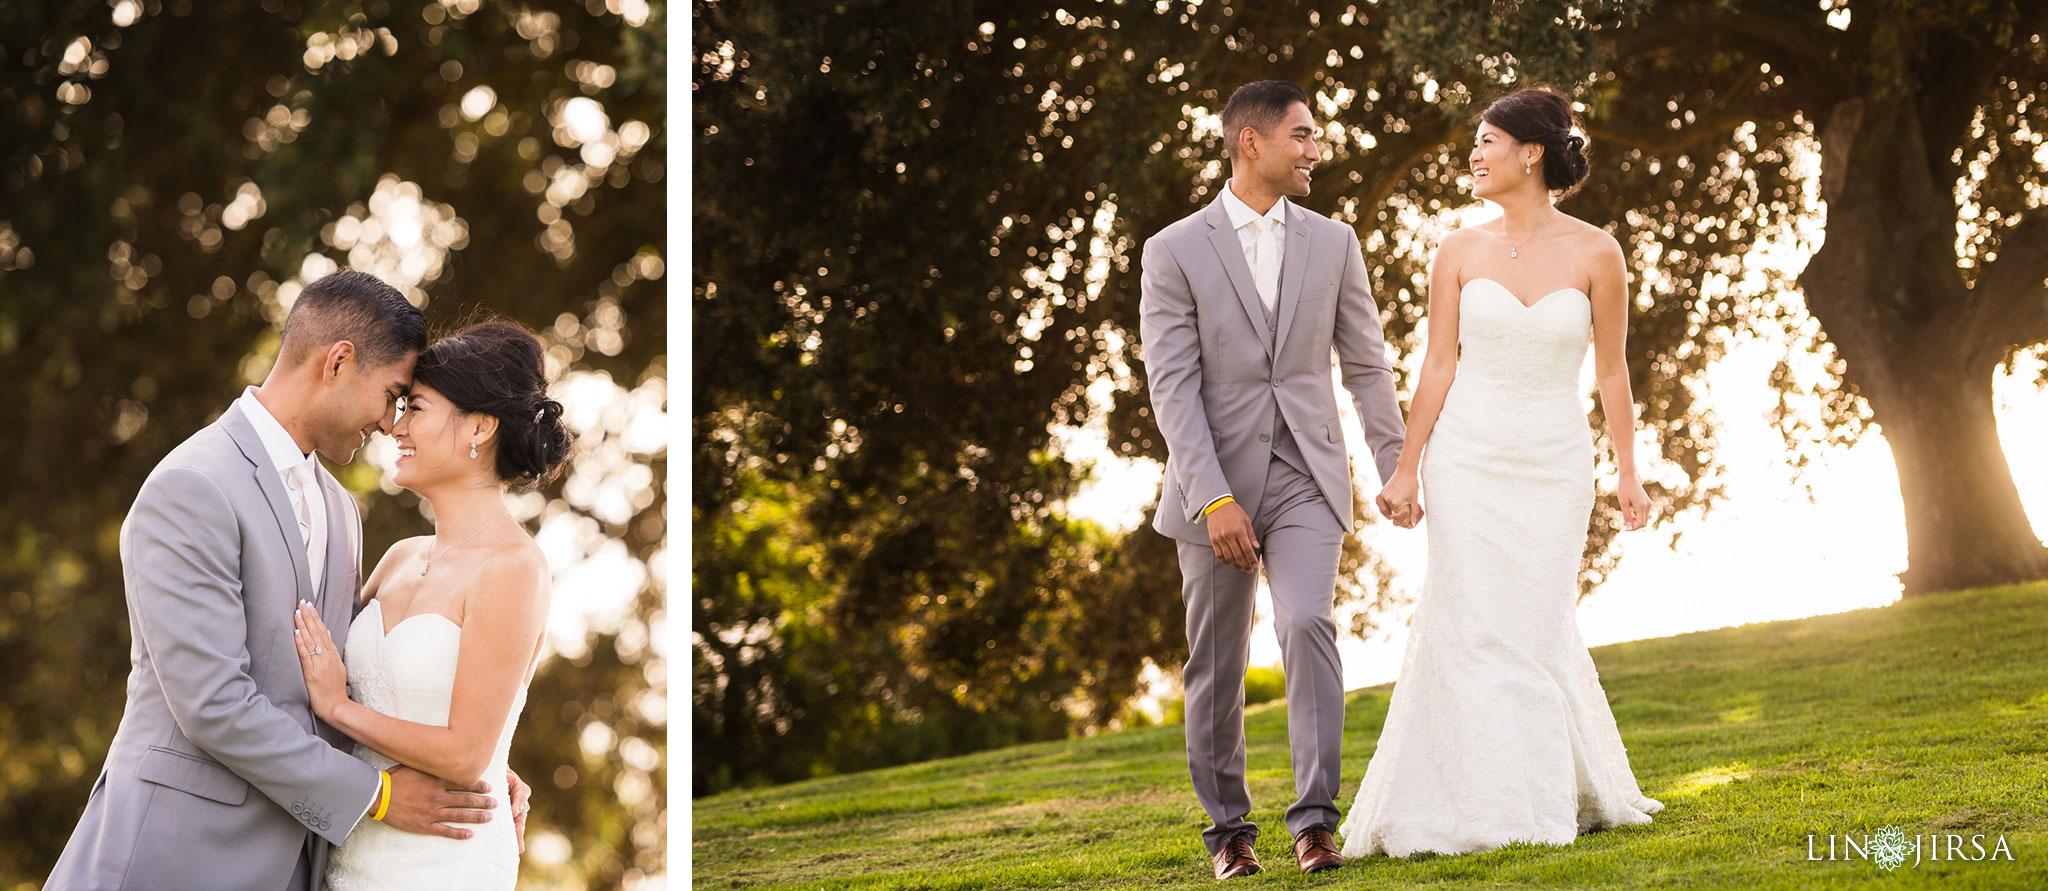 13 los verdes golf course wedding photography